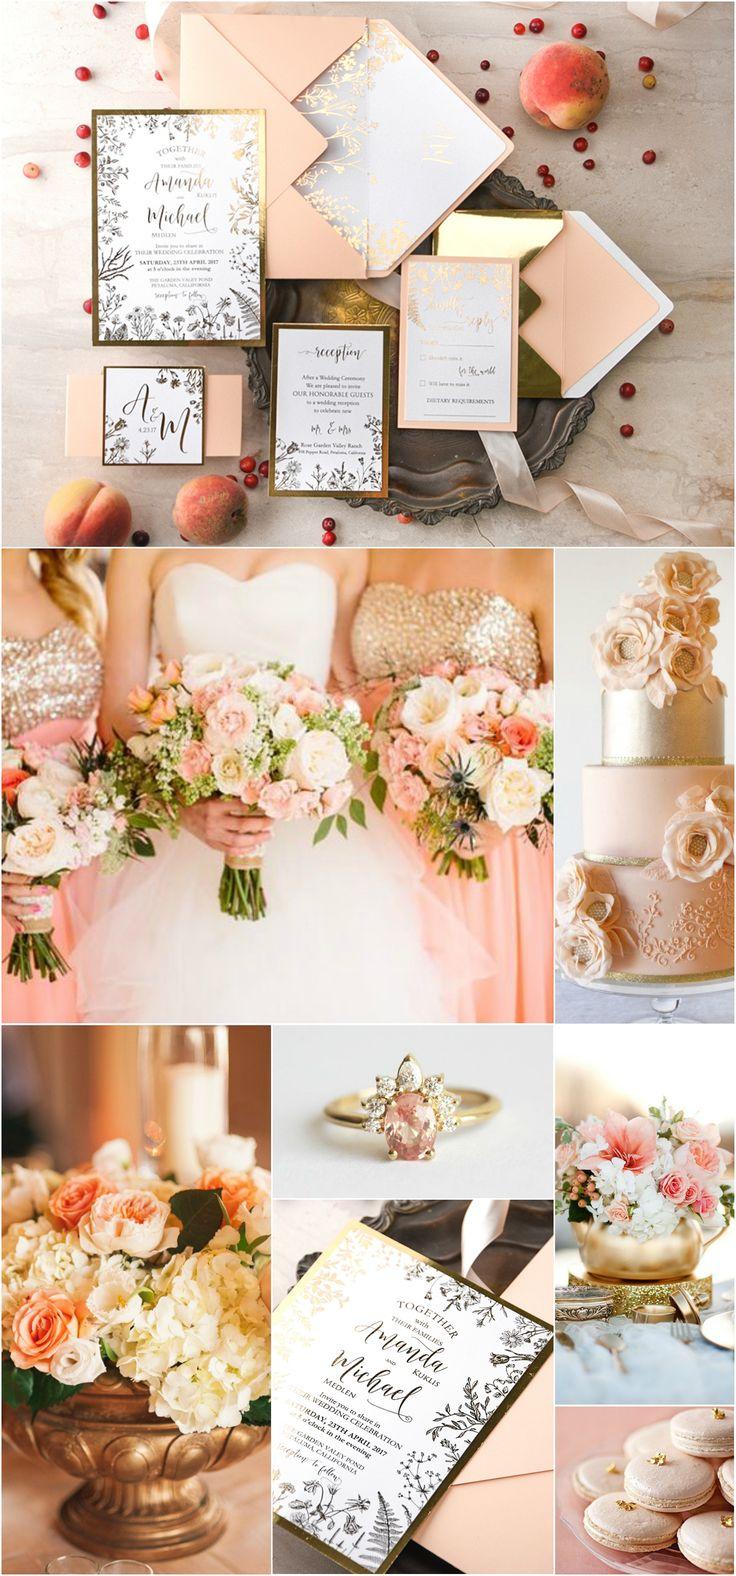 Peach & Gold Wedding Invitations #romantic #peach #blush #gold #weddingideas #glamorous #elegant